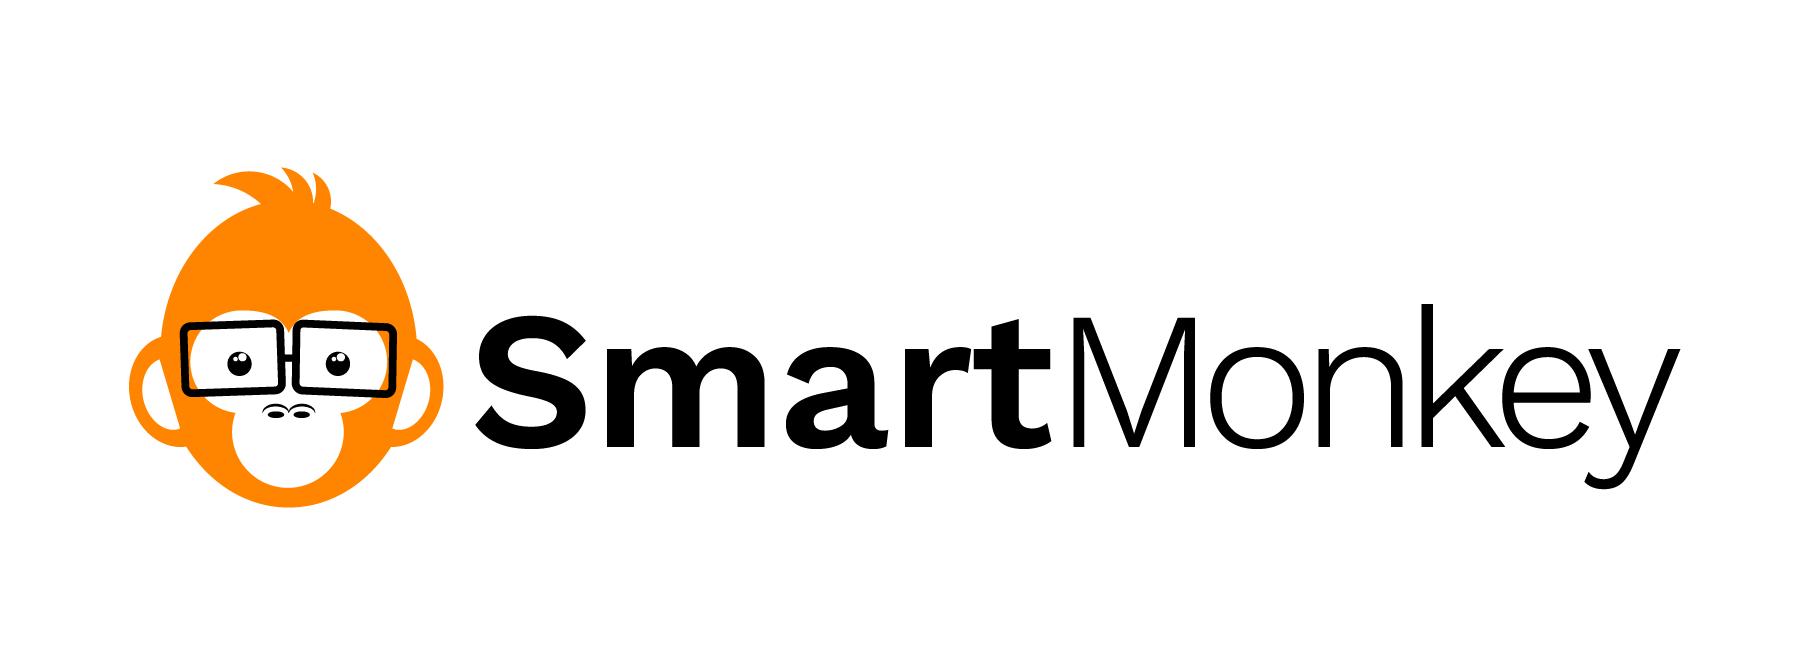 SmartMonkey logo